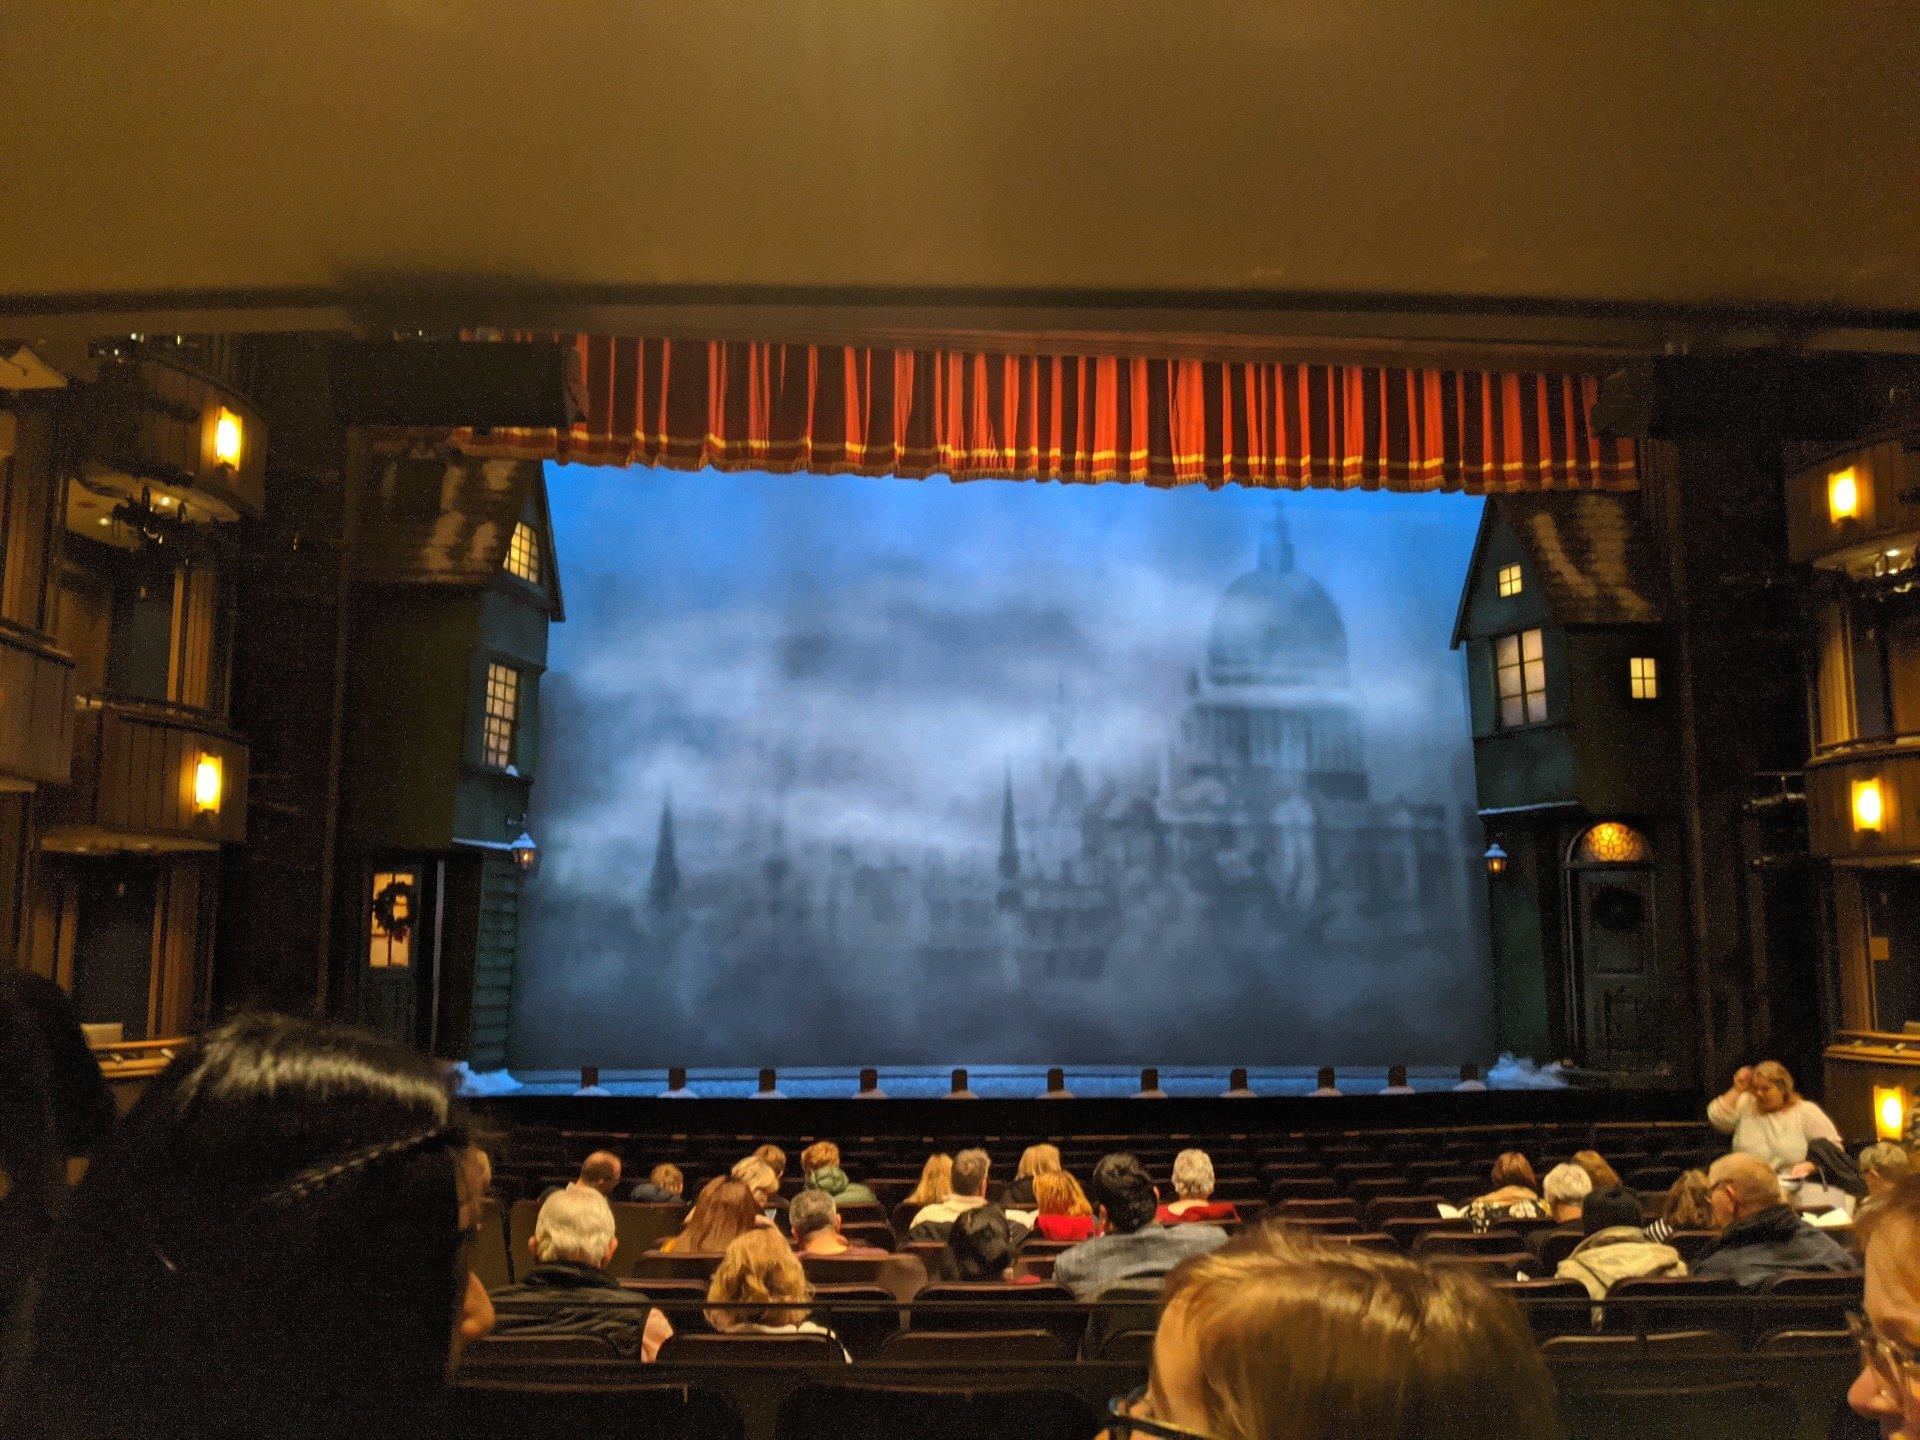 Goodman Theatre - Albert Theatre Section Aisle 3 Row P Seat 23